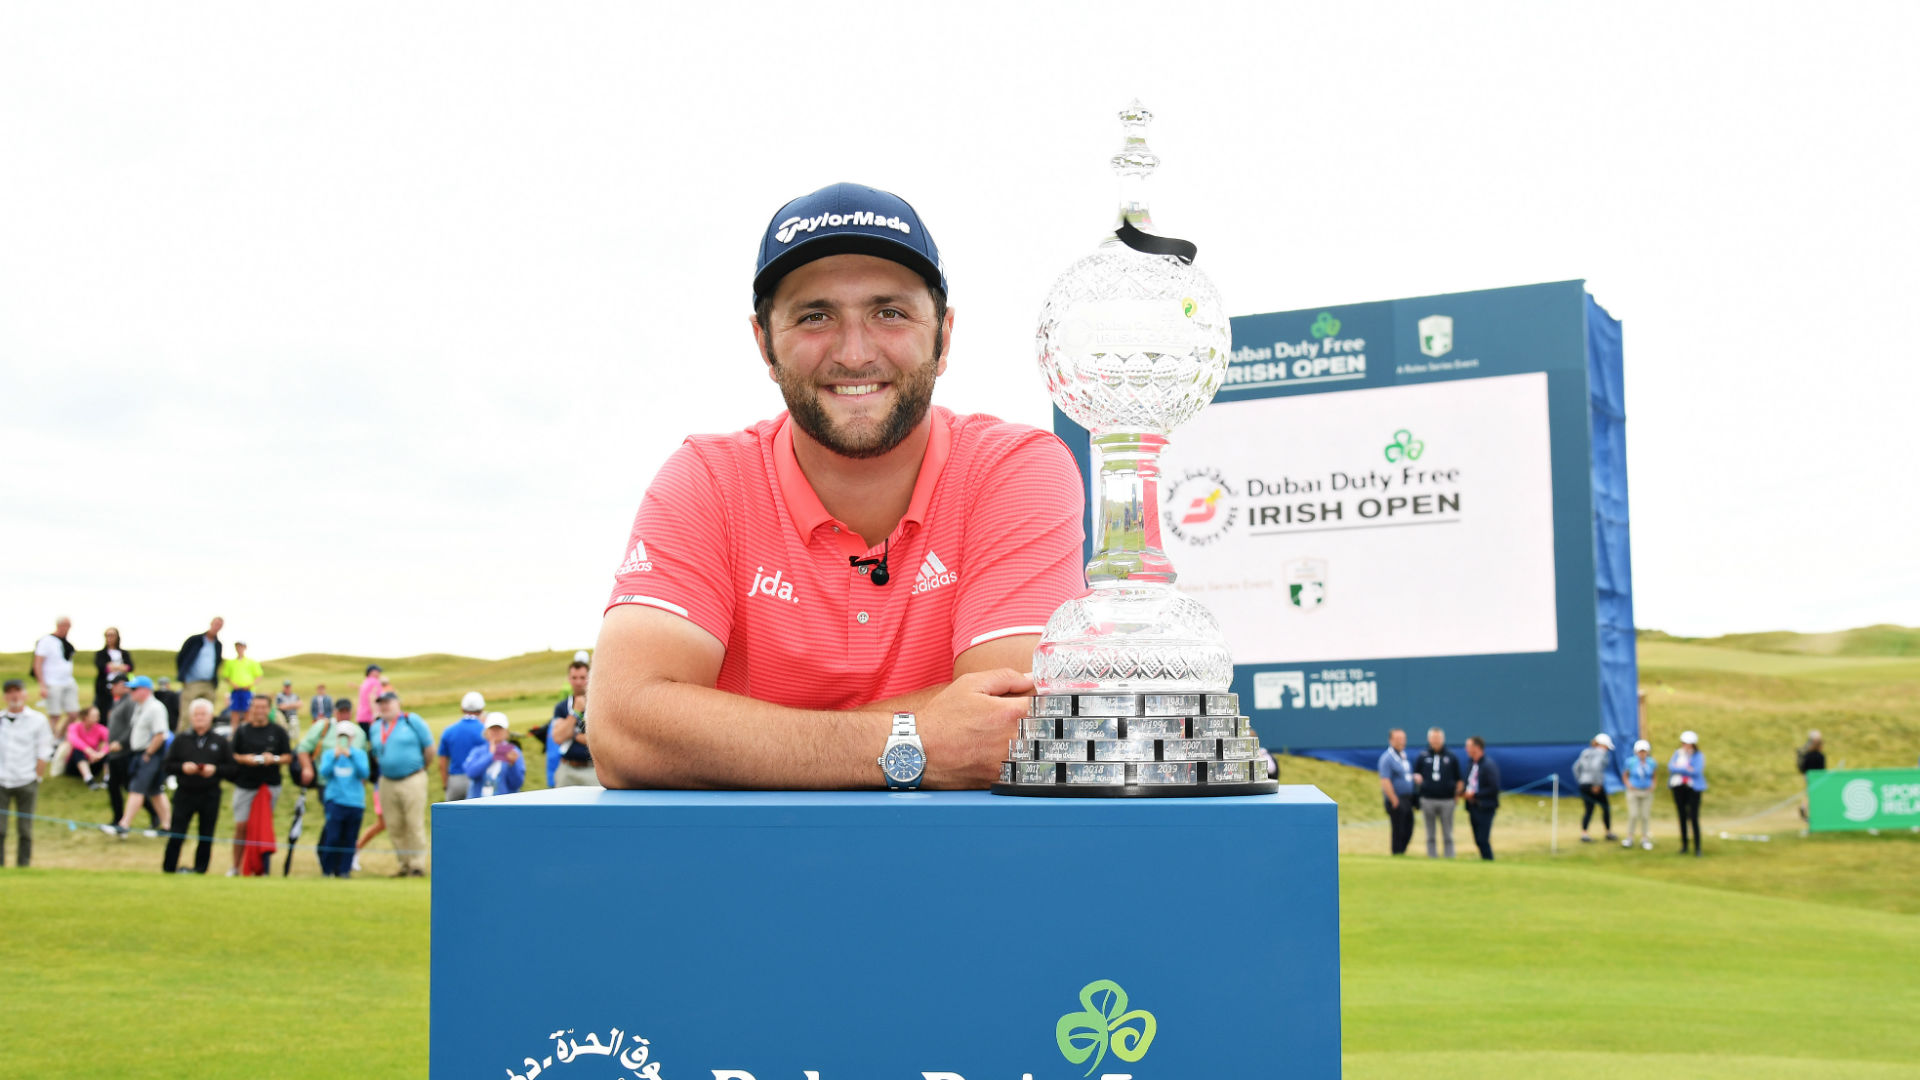 Coronavirus: Irish Open postponed as European Tour evaluates schedule